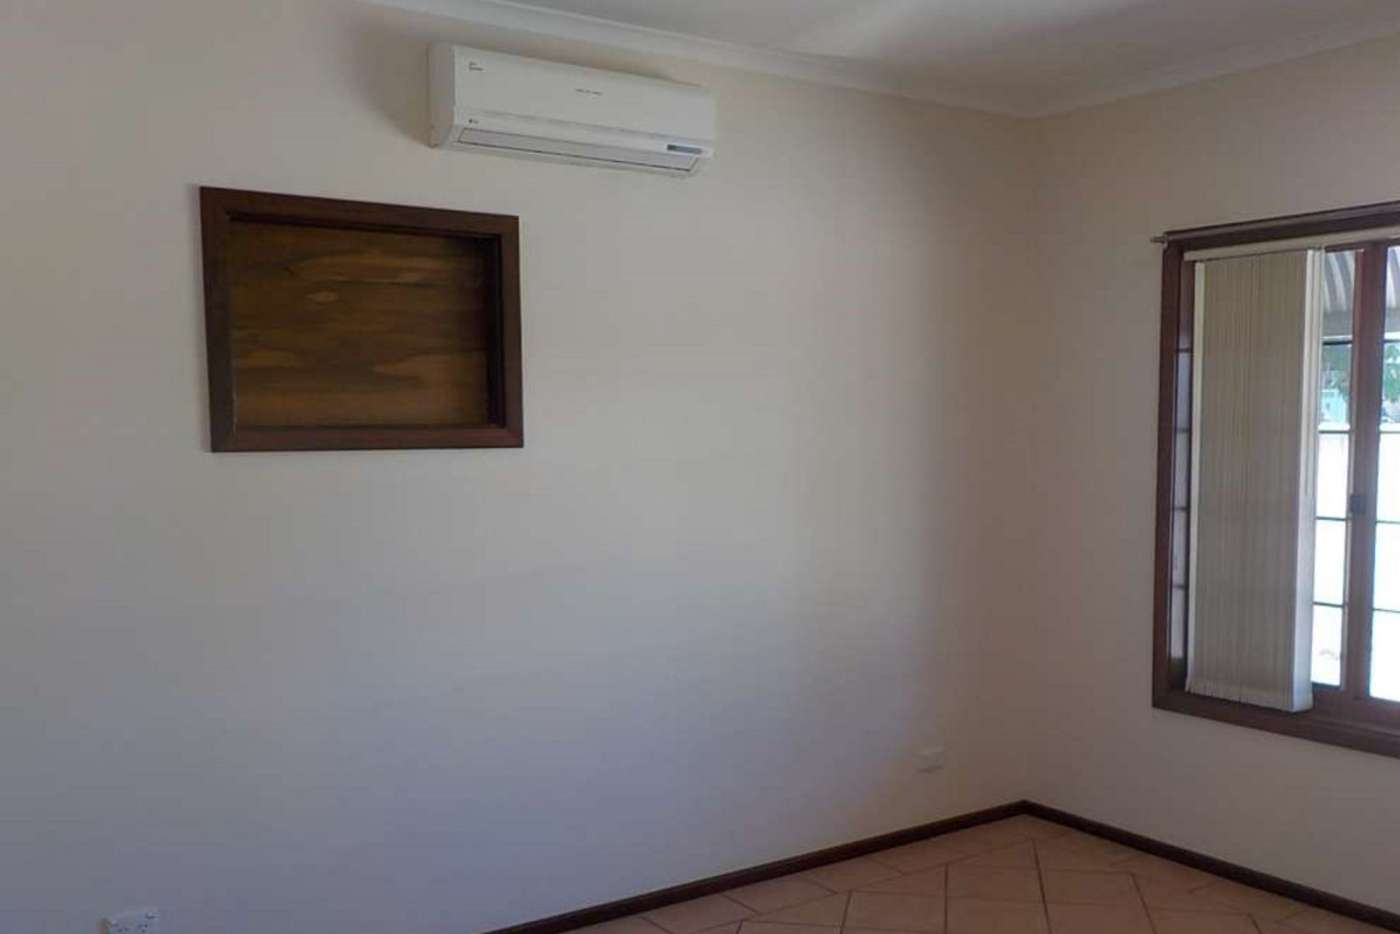 Sixth view of Homely house listing, 4 Lotus Court, Kununurra WA 6743